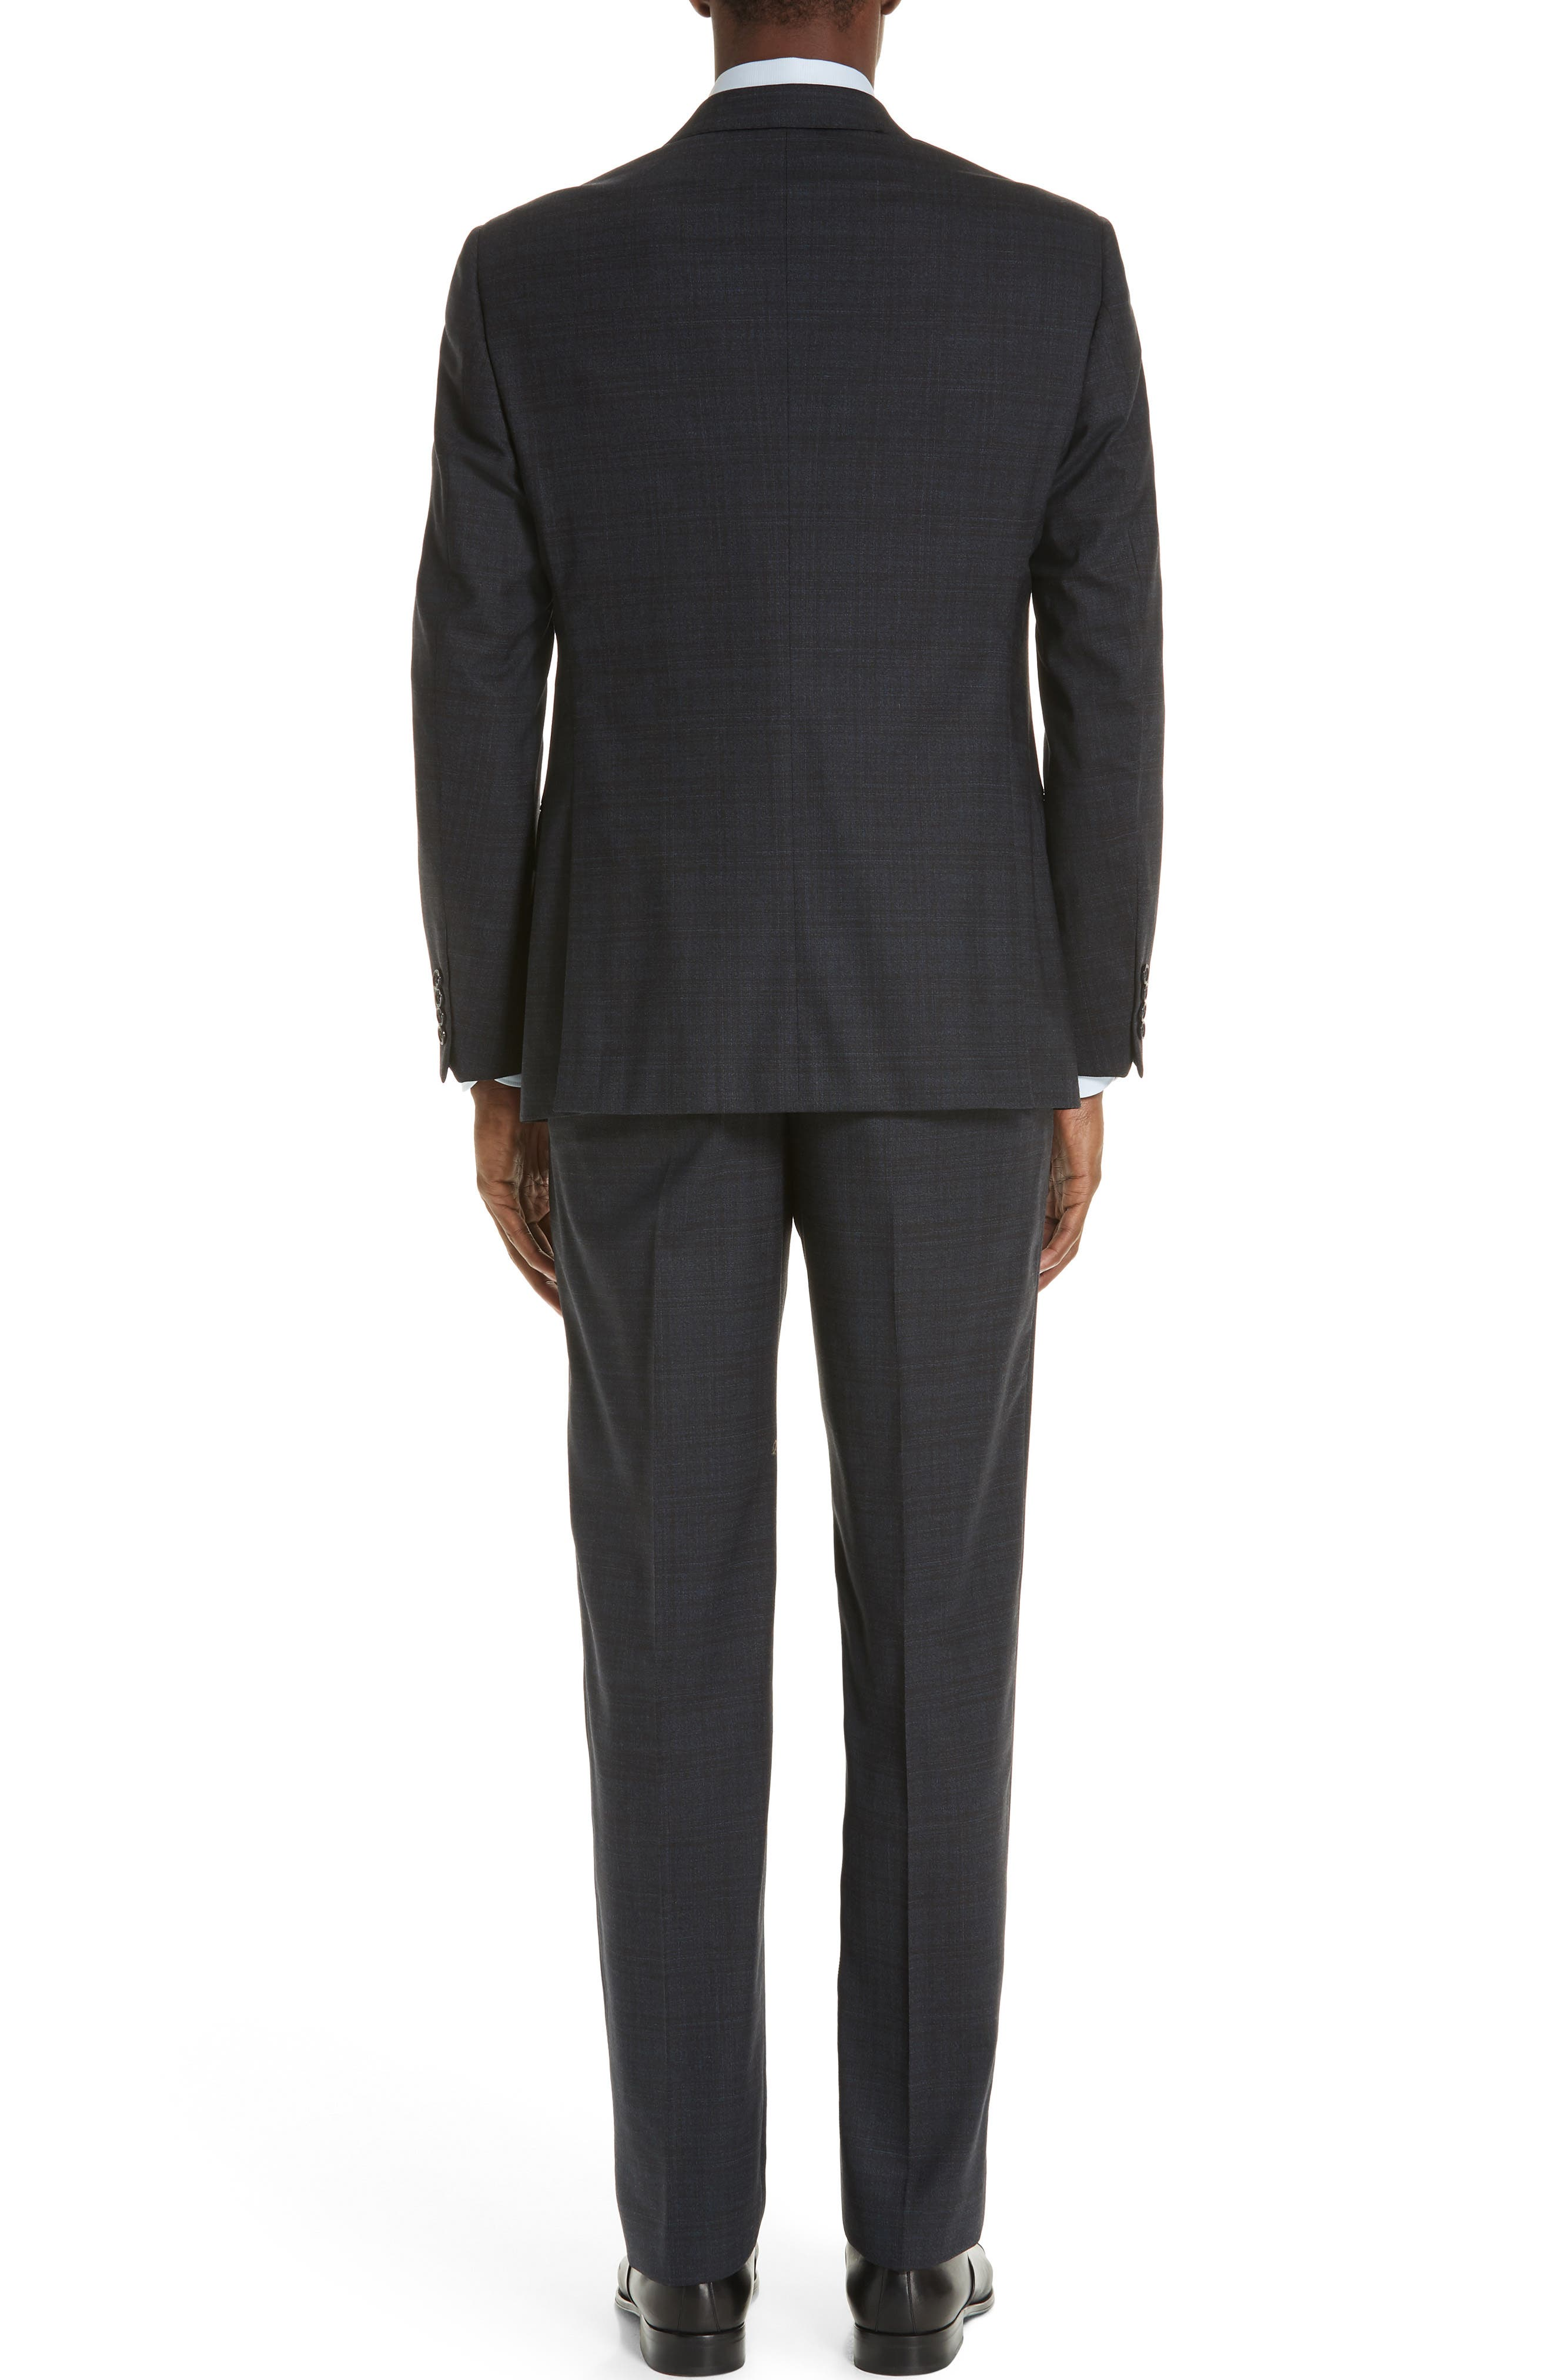 G-Line Trim Fit Stretch Plaid Wool Suit,                             Alternate thumbnail 2, color,                             NAVY/ BROWN